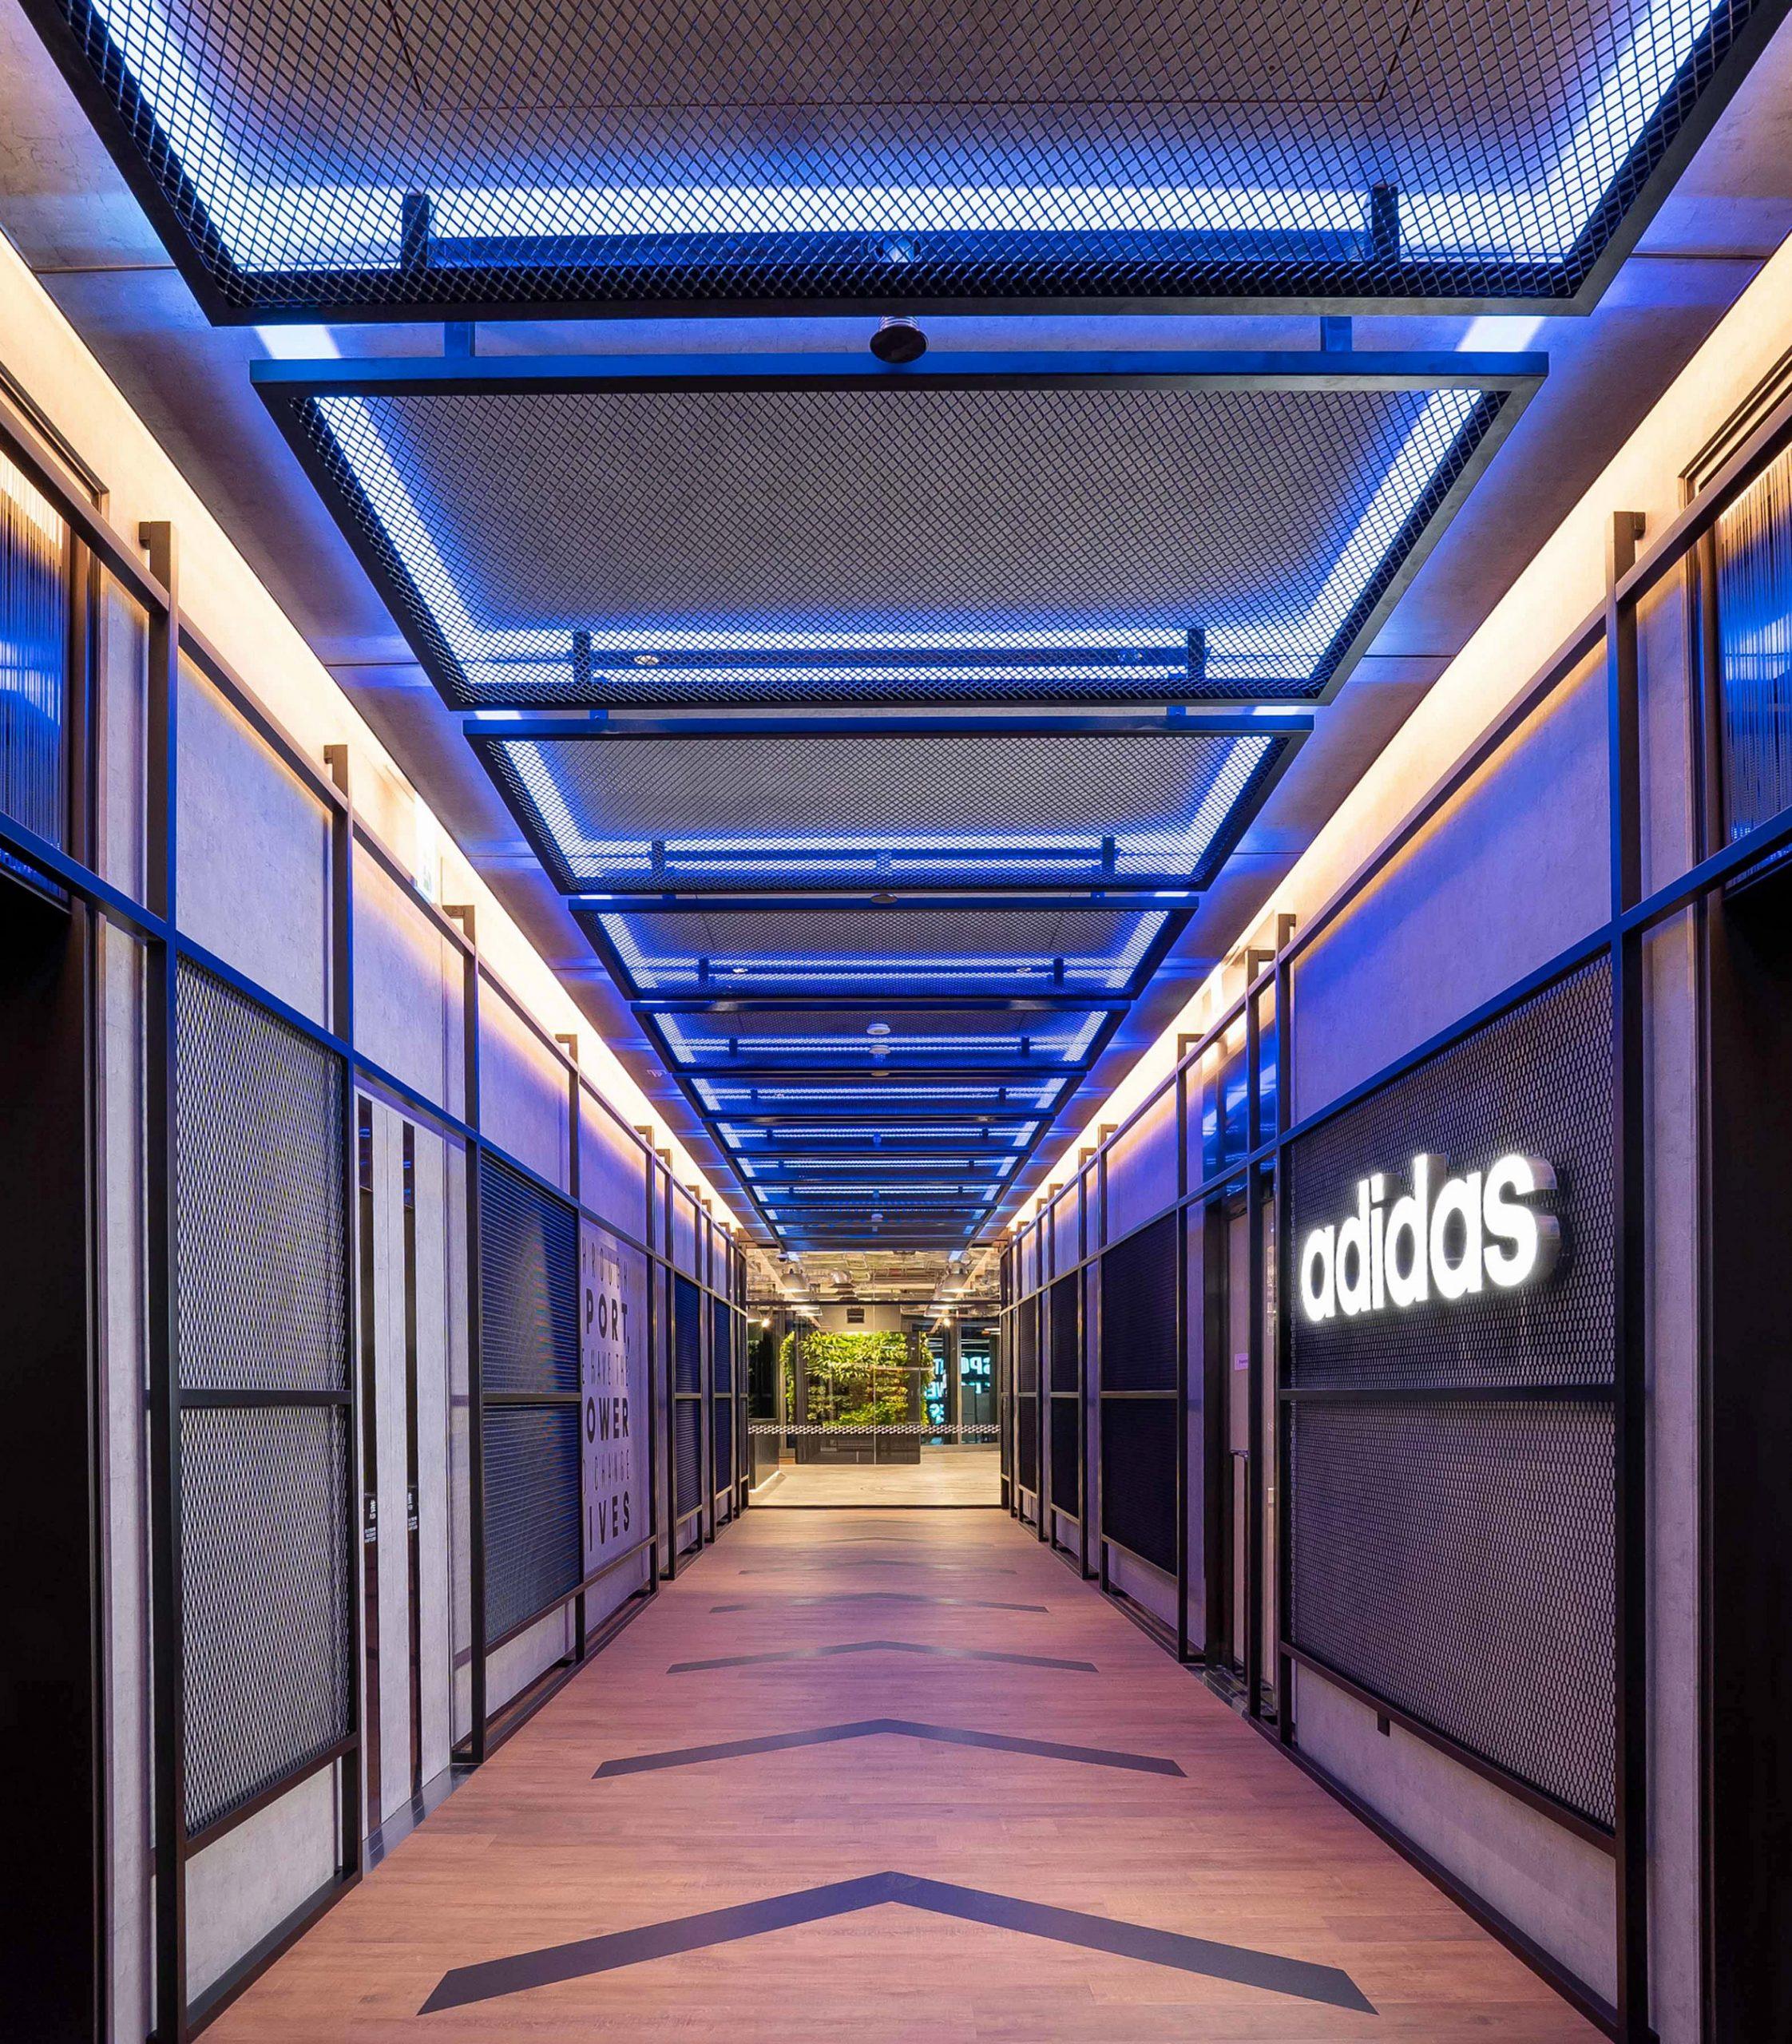 Adidas Global Sourcing Headquarters in Hong Kong